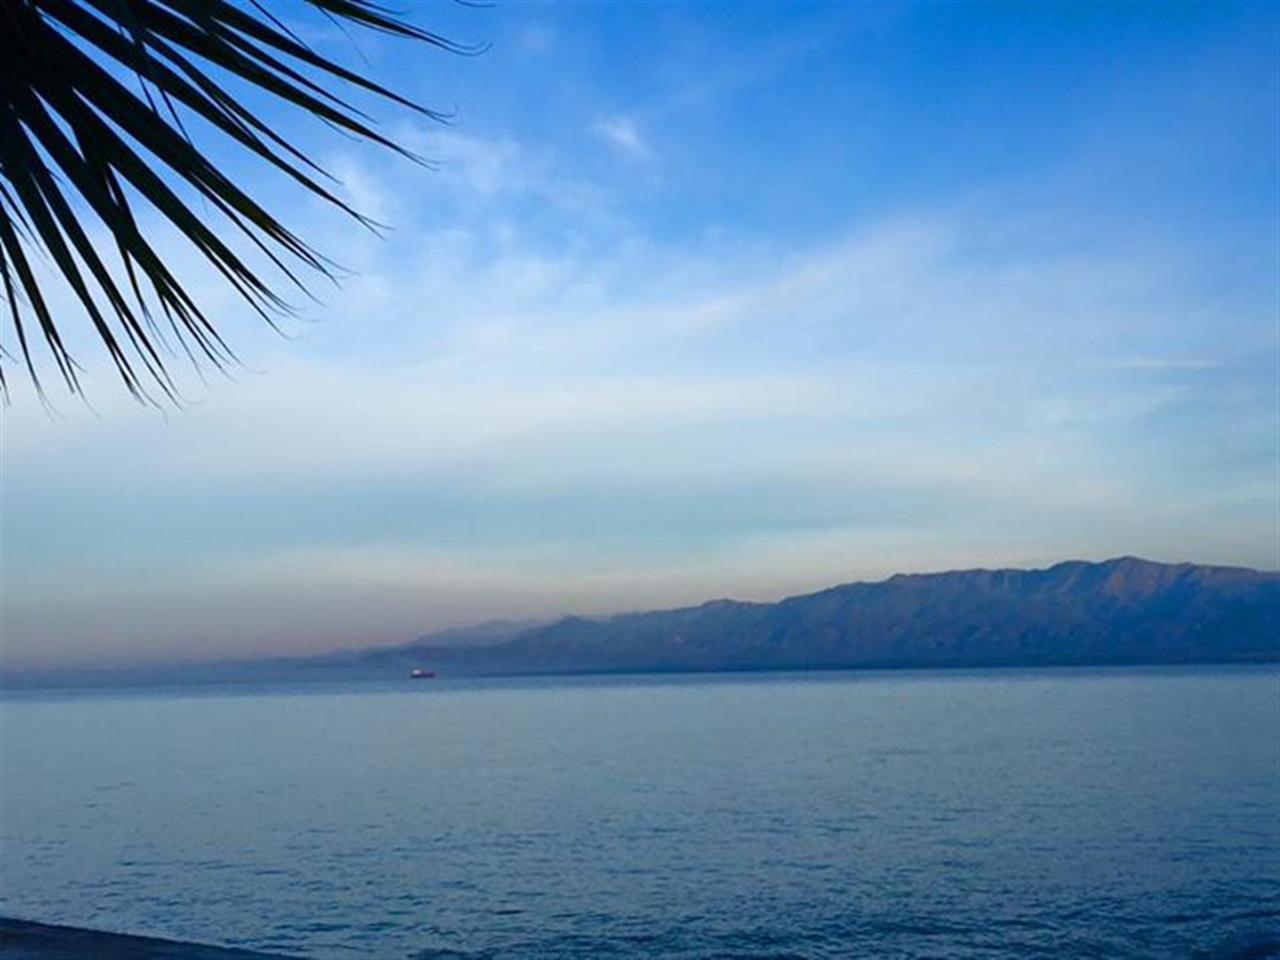 Ocean views - North Coast of the DR